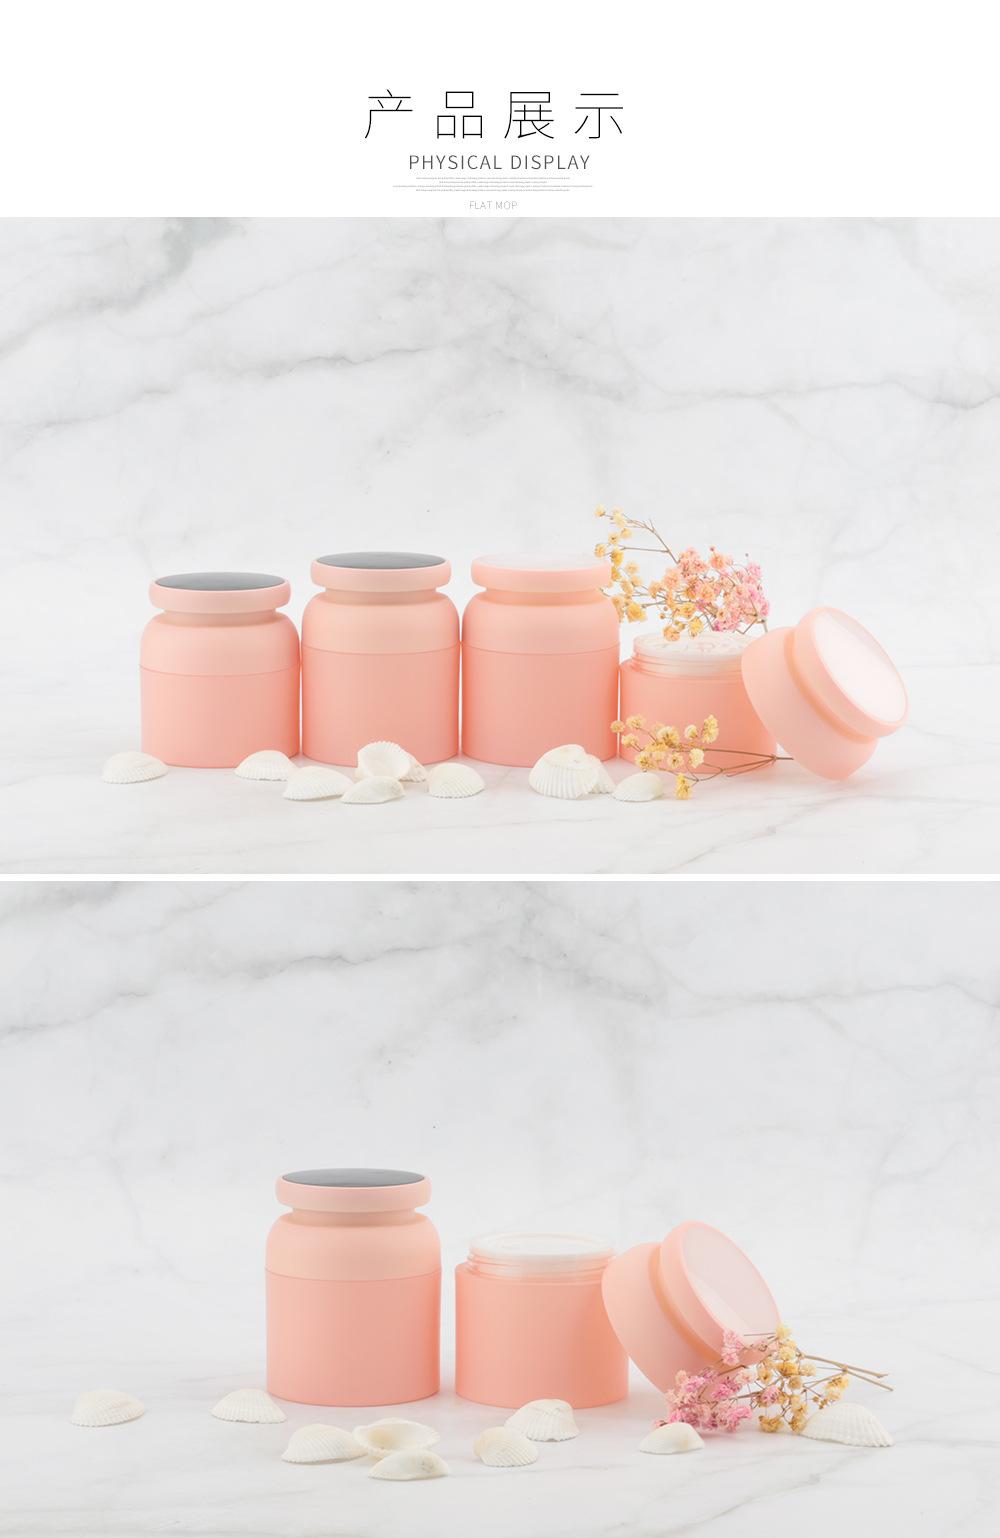 Korean pink acrylic cosmetic jars